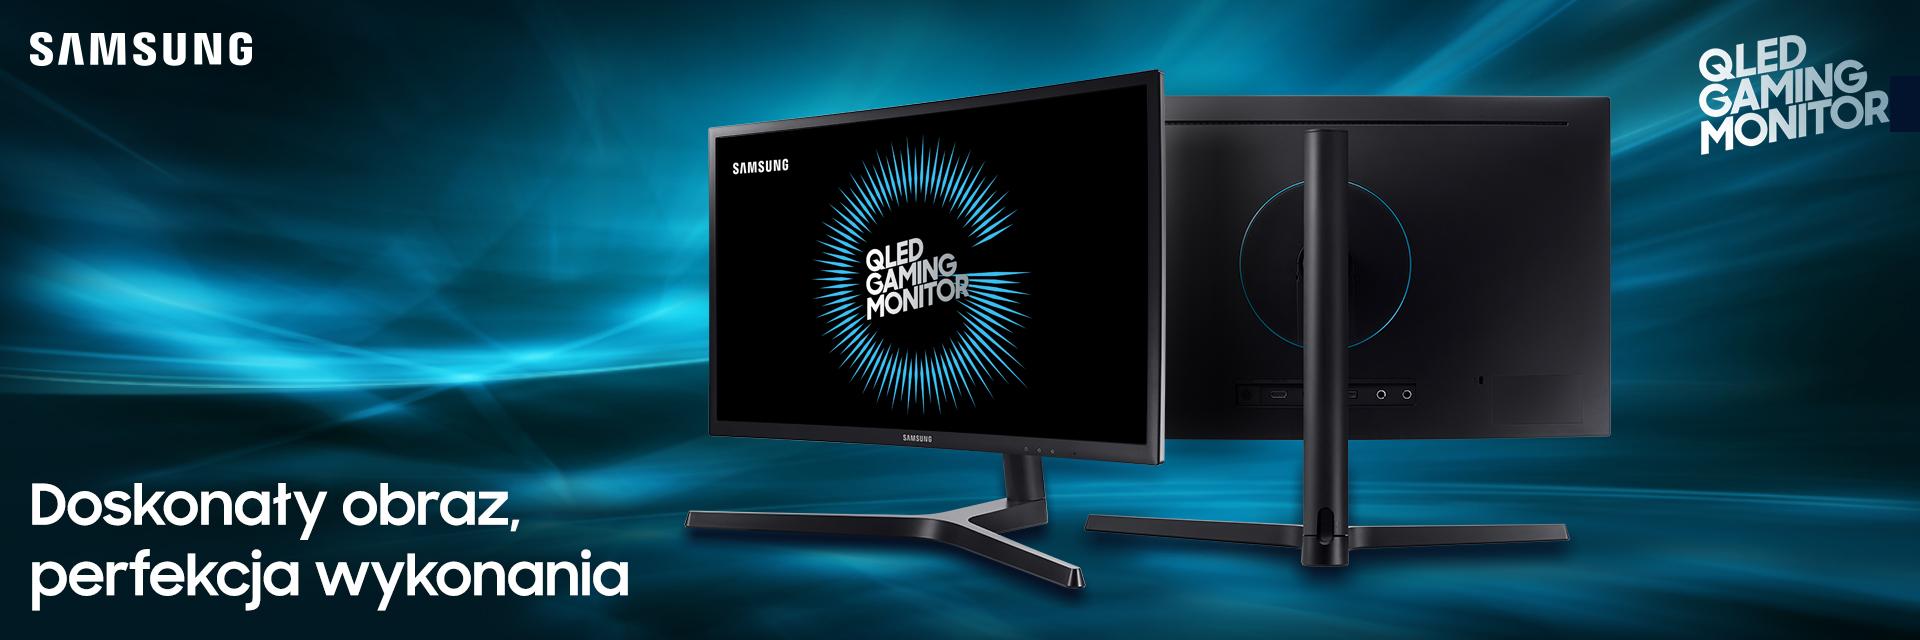 Samsung Monitor Kv Lc24fg73fquxen 1920x640